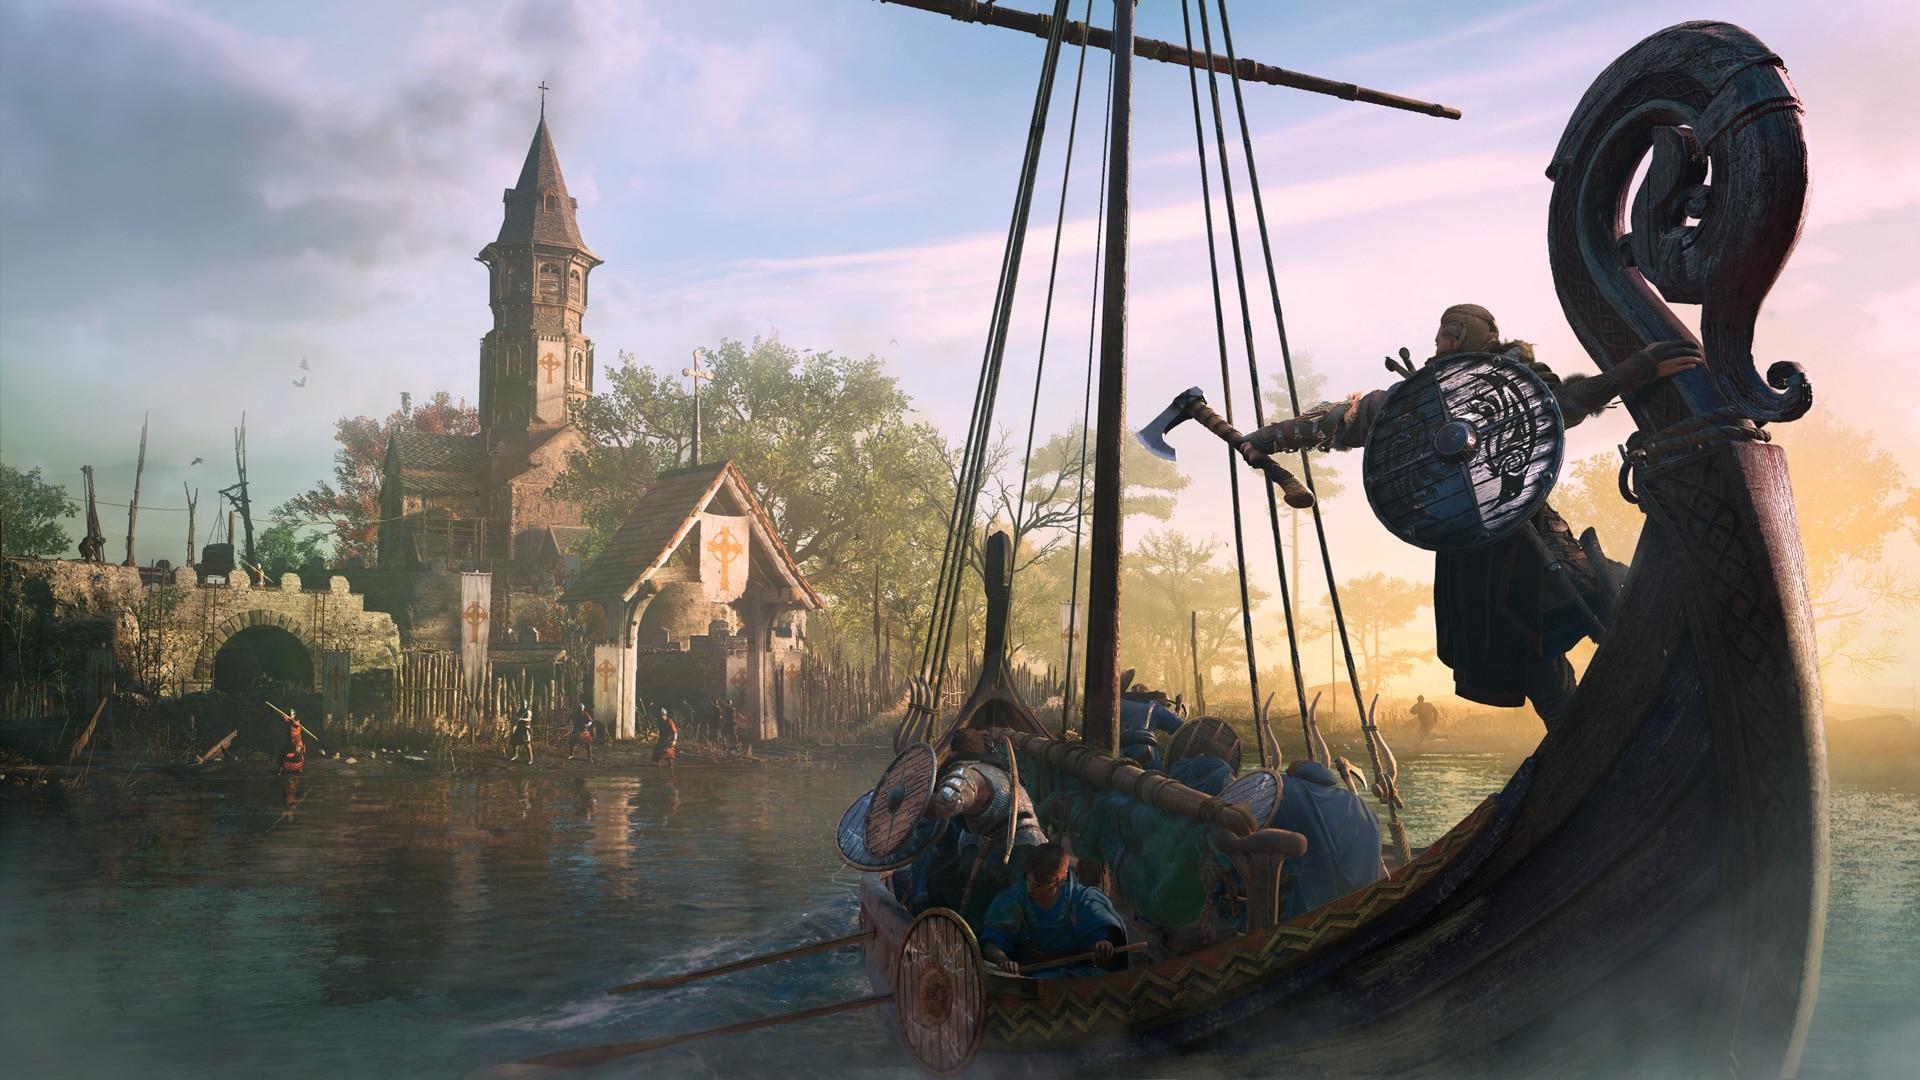 Assassin's Creed Valhalla – Assault Castles, Repair Broken Kingdoms, and Recruit a Cat Raider on November 17 - Image 4